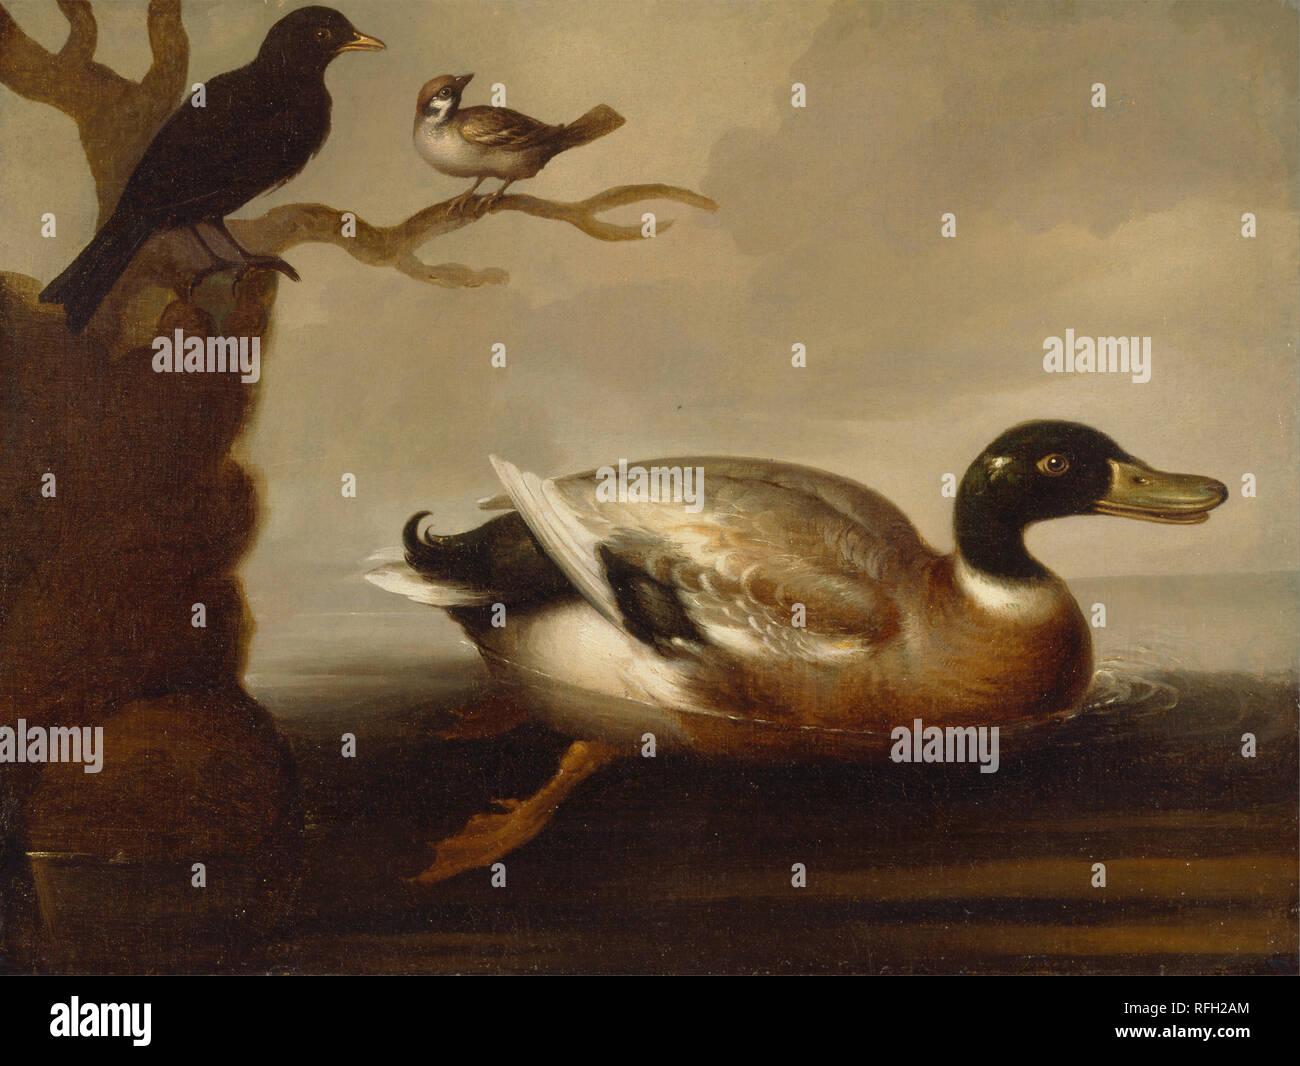 Marmaduke Cradock Mallards on a Pond Wall Art Poster Print